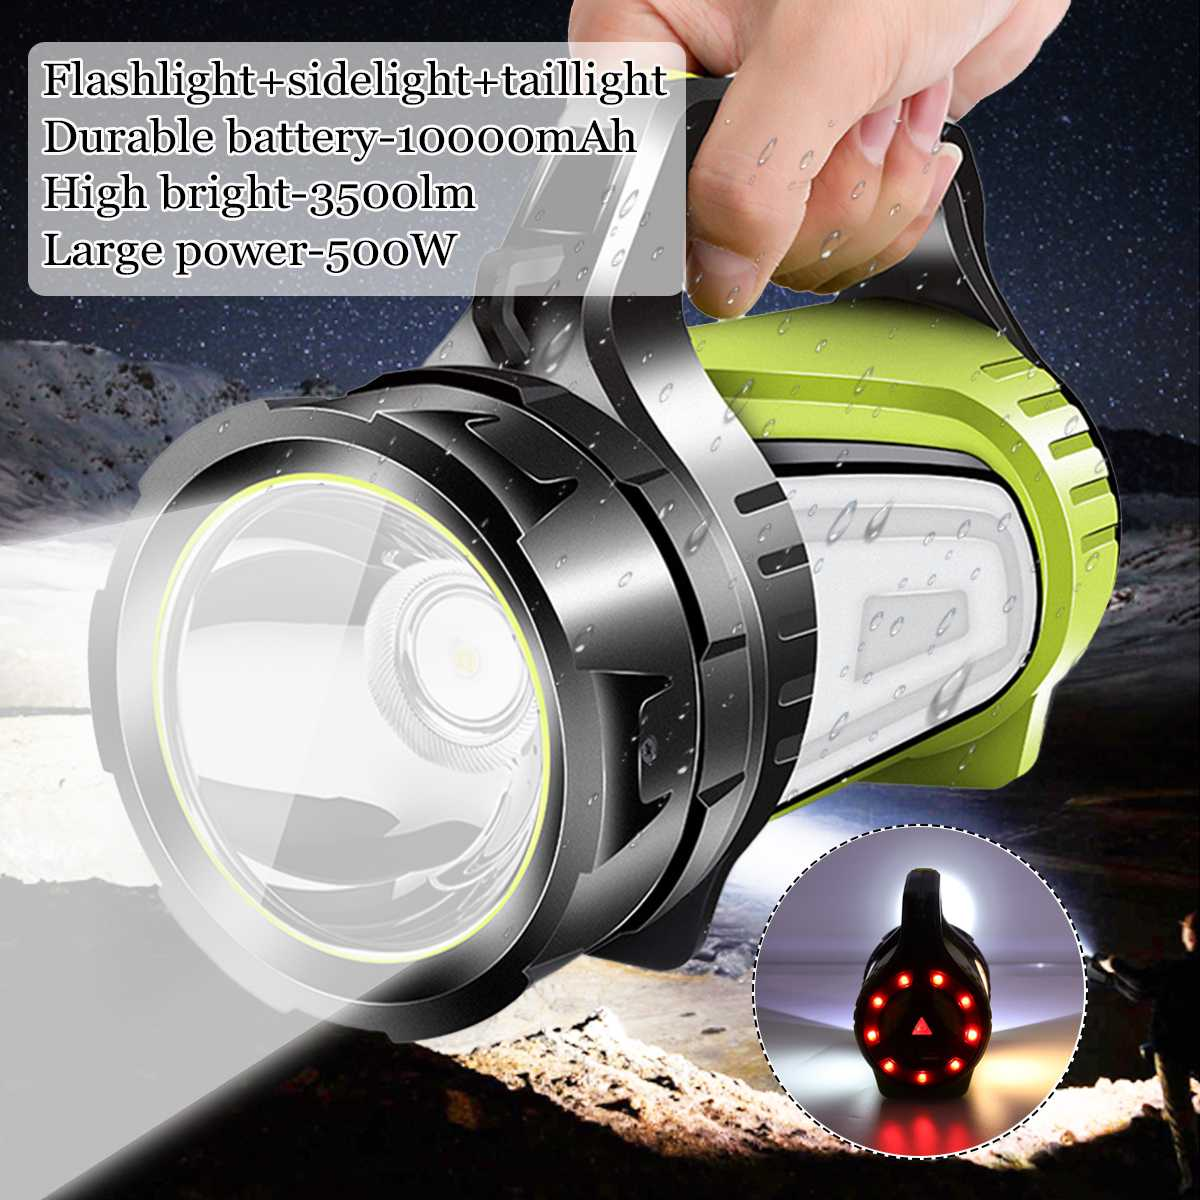 10000mAh USB Charging LED Work Light Torch Spotlight Hand Lamp Camping Lantern Searchlight For Hiking Hunting Flashlight